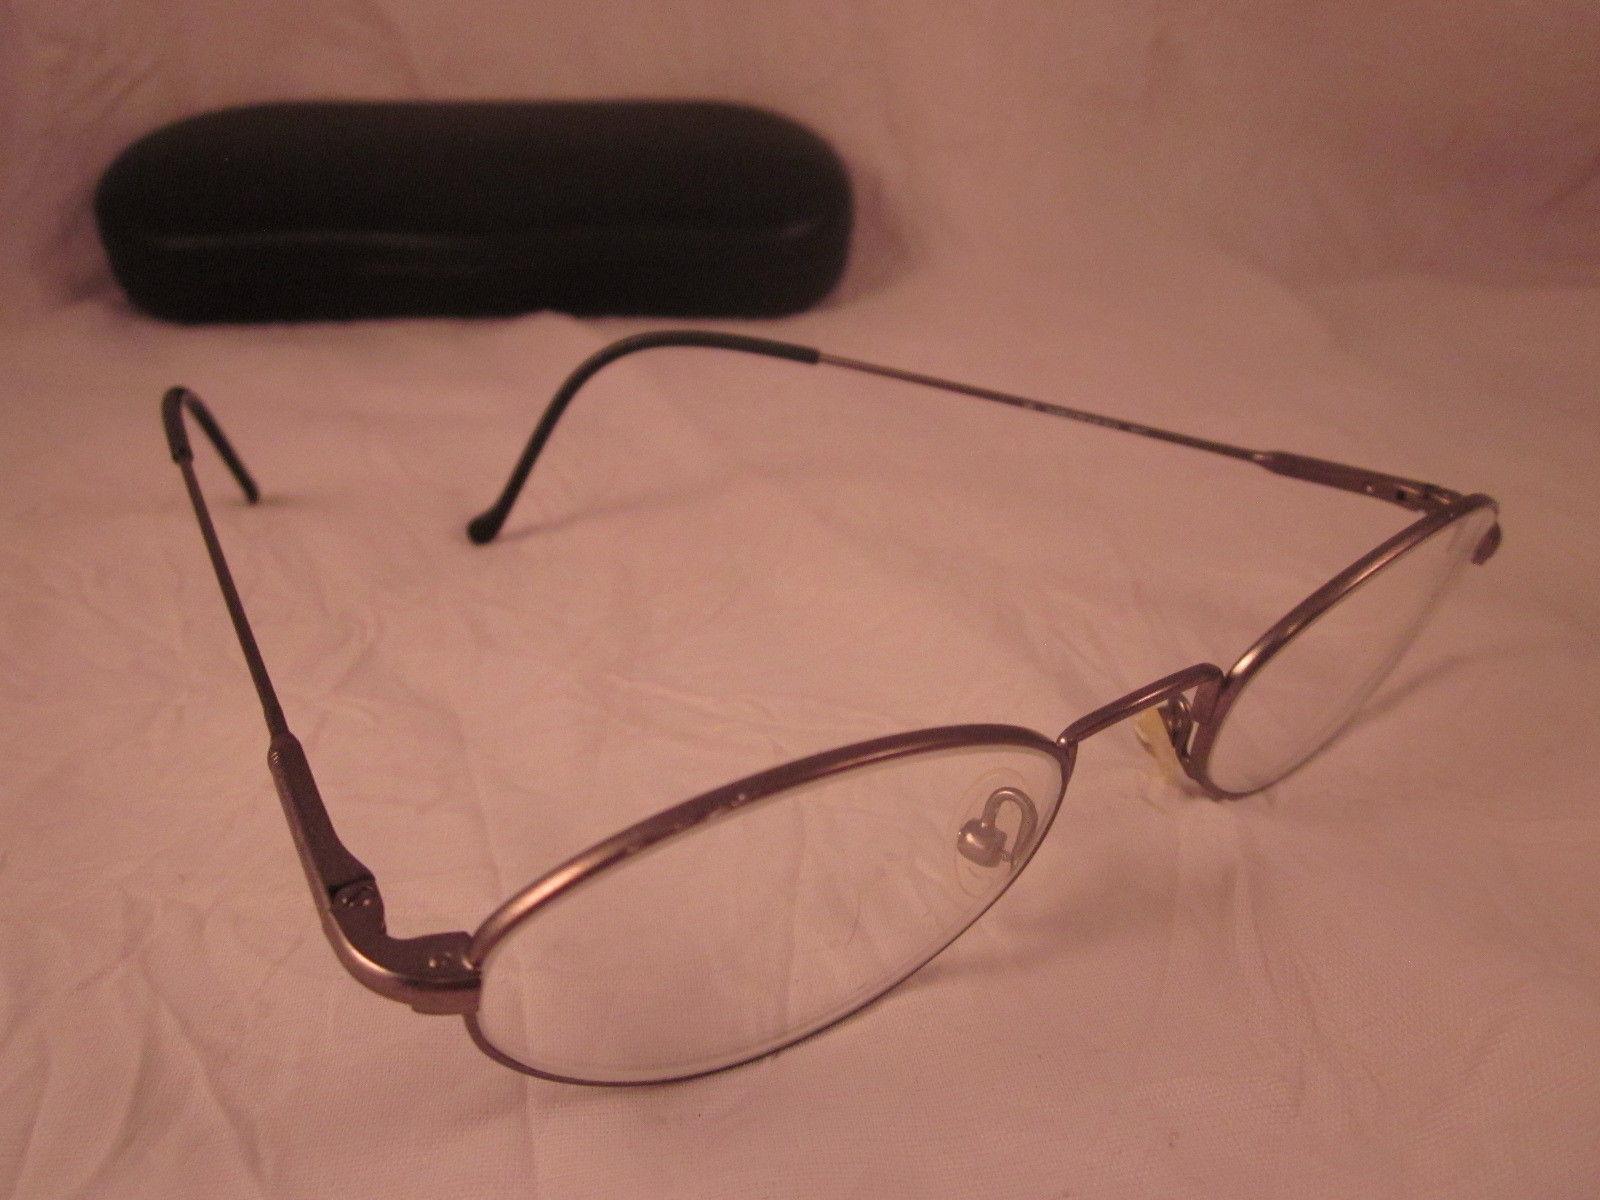 21c42b5941 SAFILO ELASTA Rx TEAM 3919 Eyeglasses Gray Black Oval Metal Full Rim Frames  -  16.68